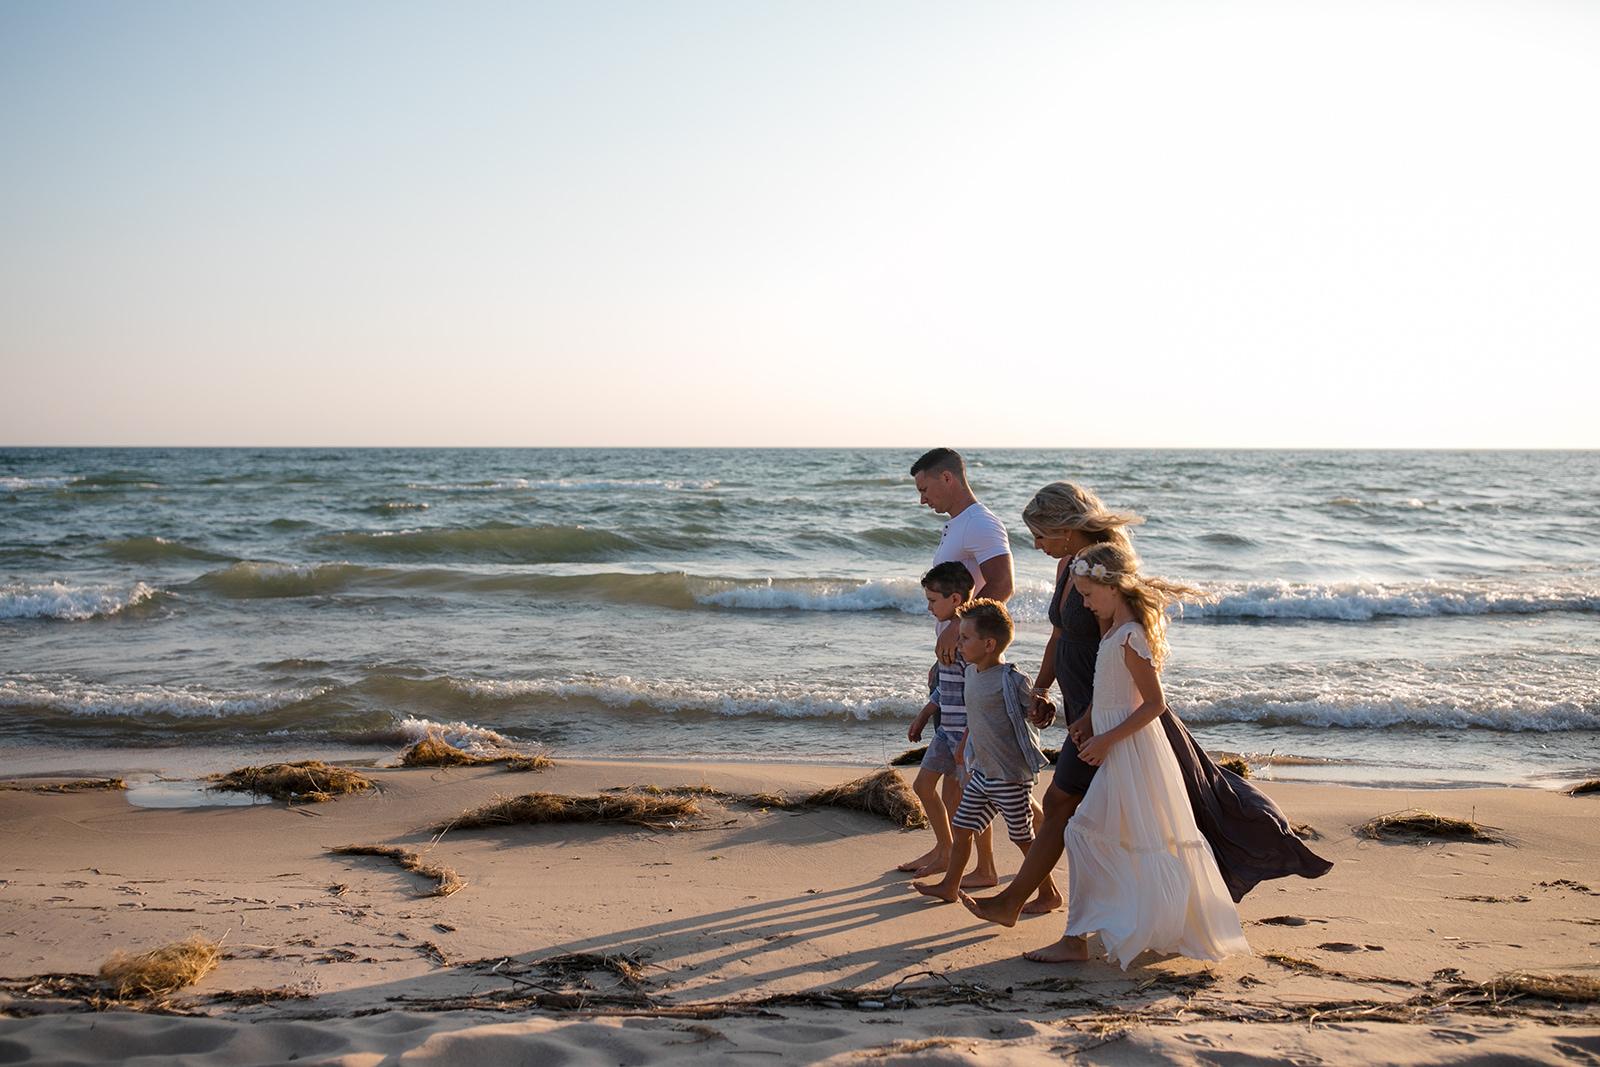 michigan-storytelling-photographer-ludington-mi-state-park-andrews-family-sunset-session-108.jpg